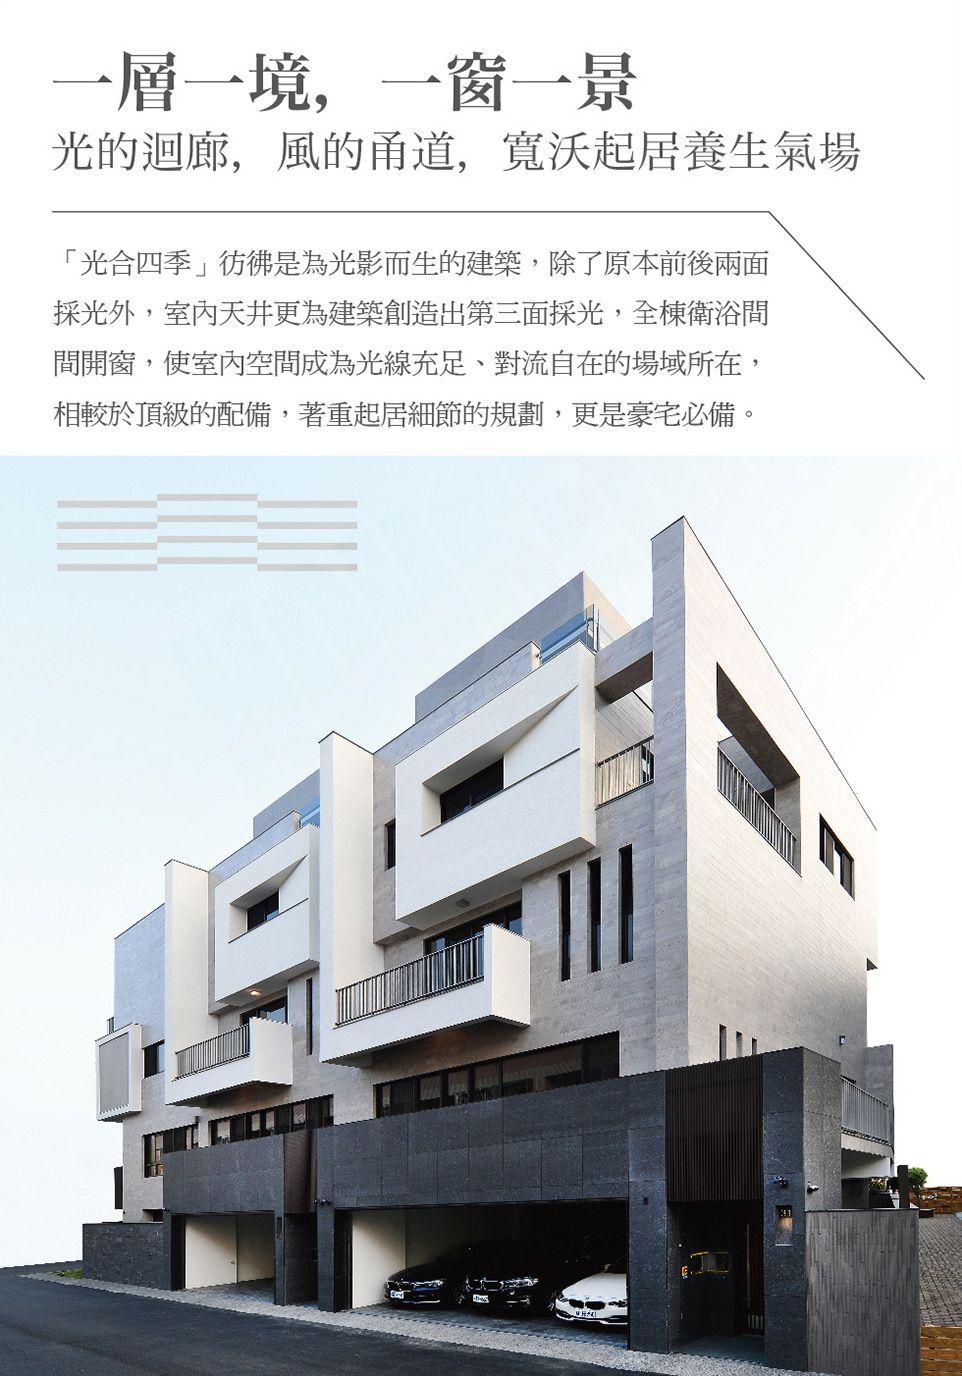 台南預售屋網站 Facade House Facade Architecture Modern Townhouse